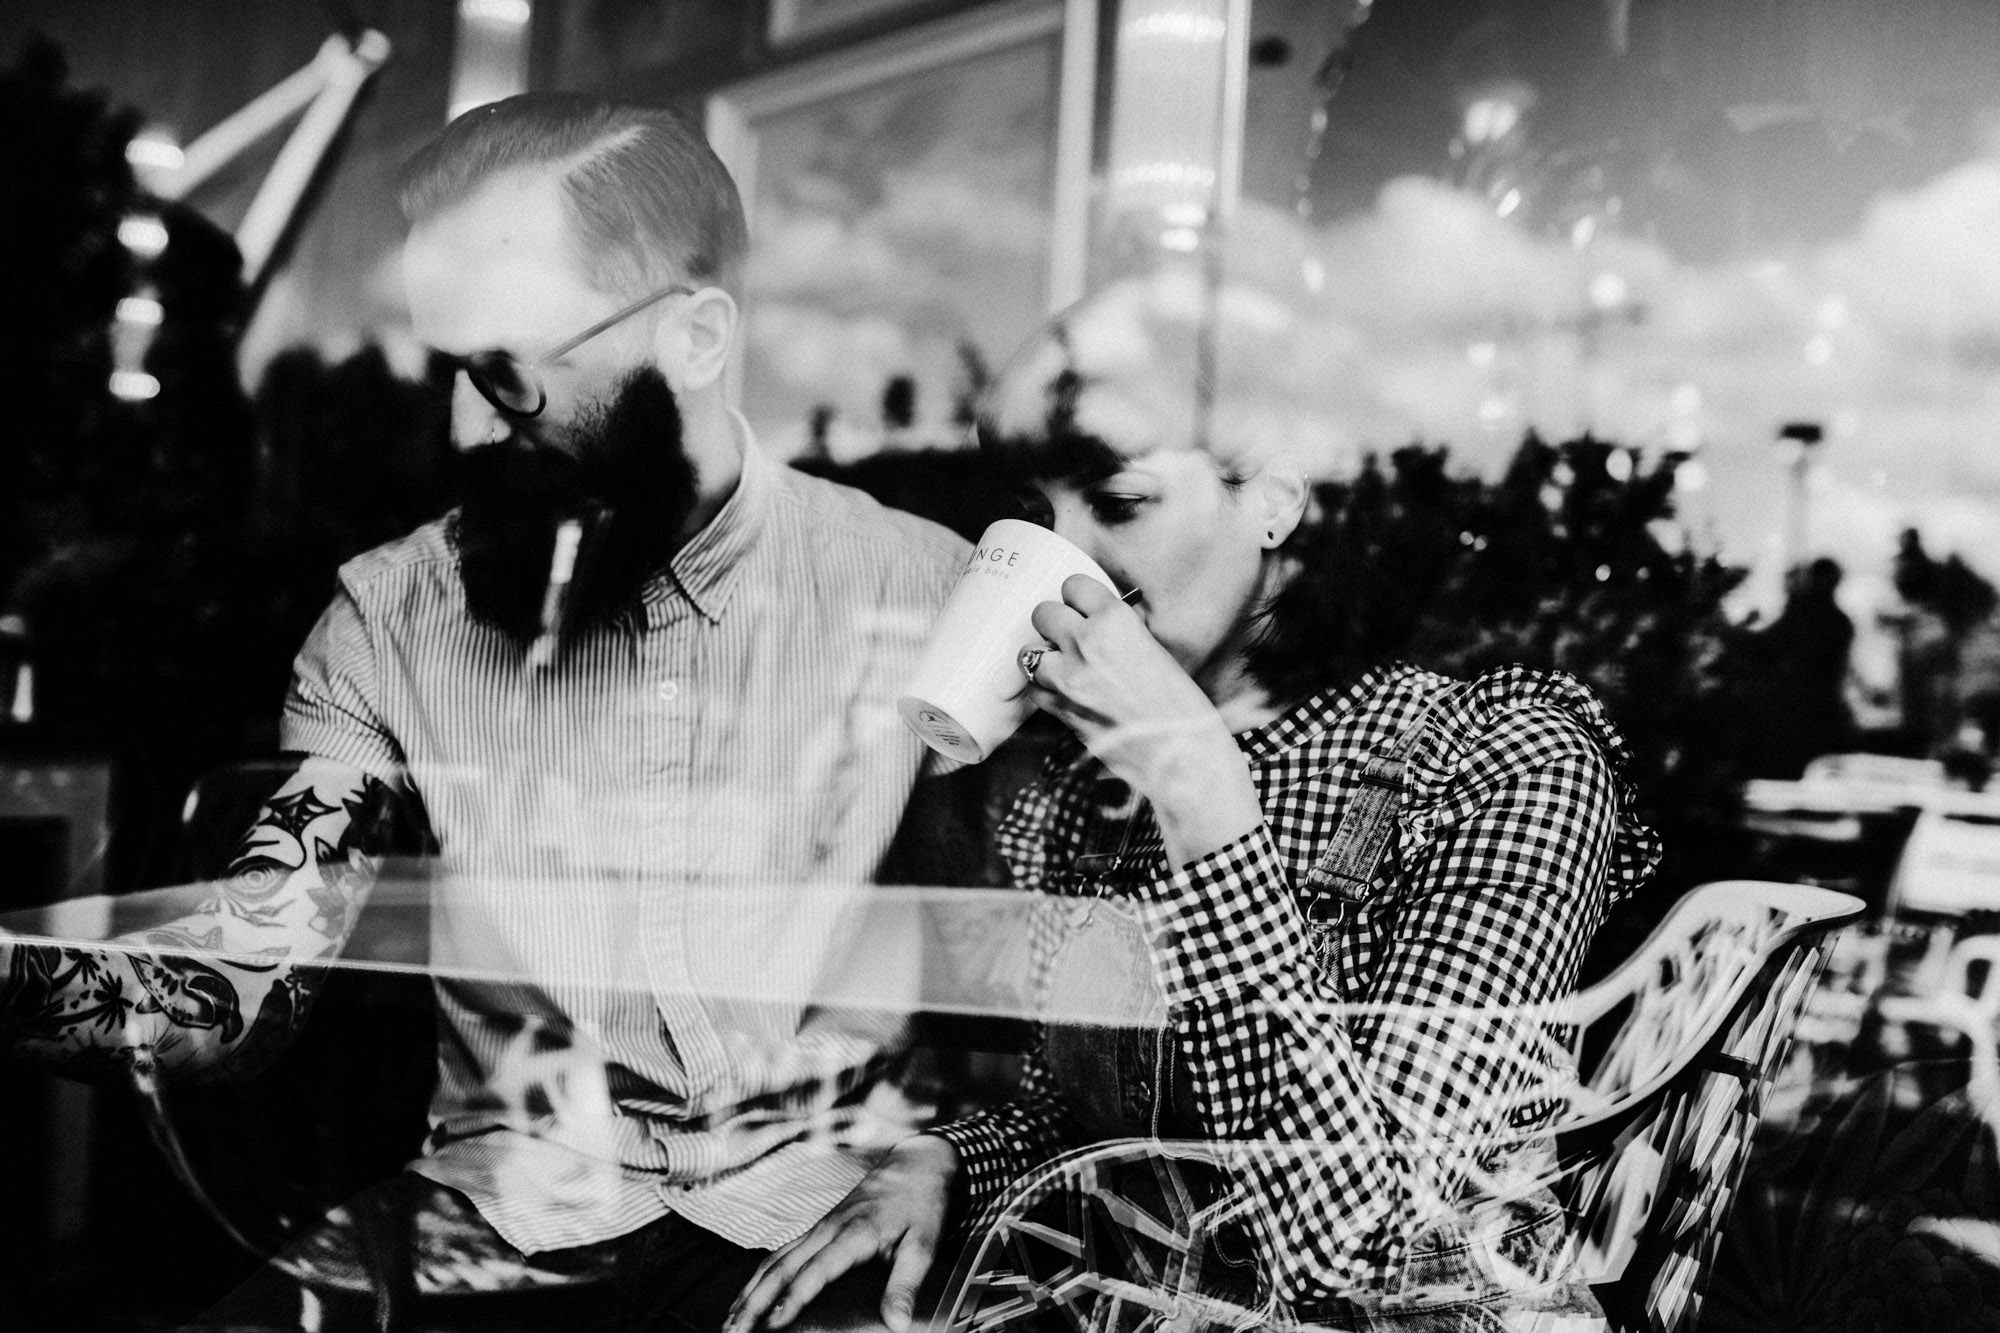 Cafe-Bar-Engagement-Photography19.jpg